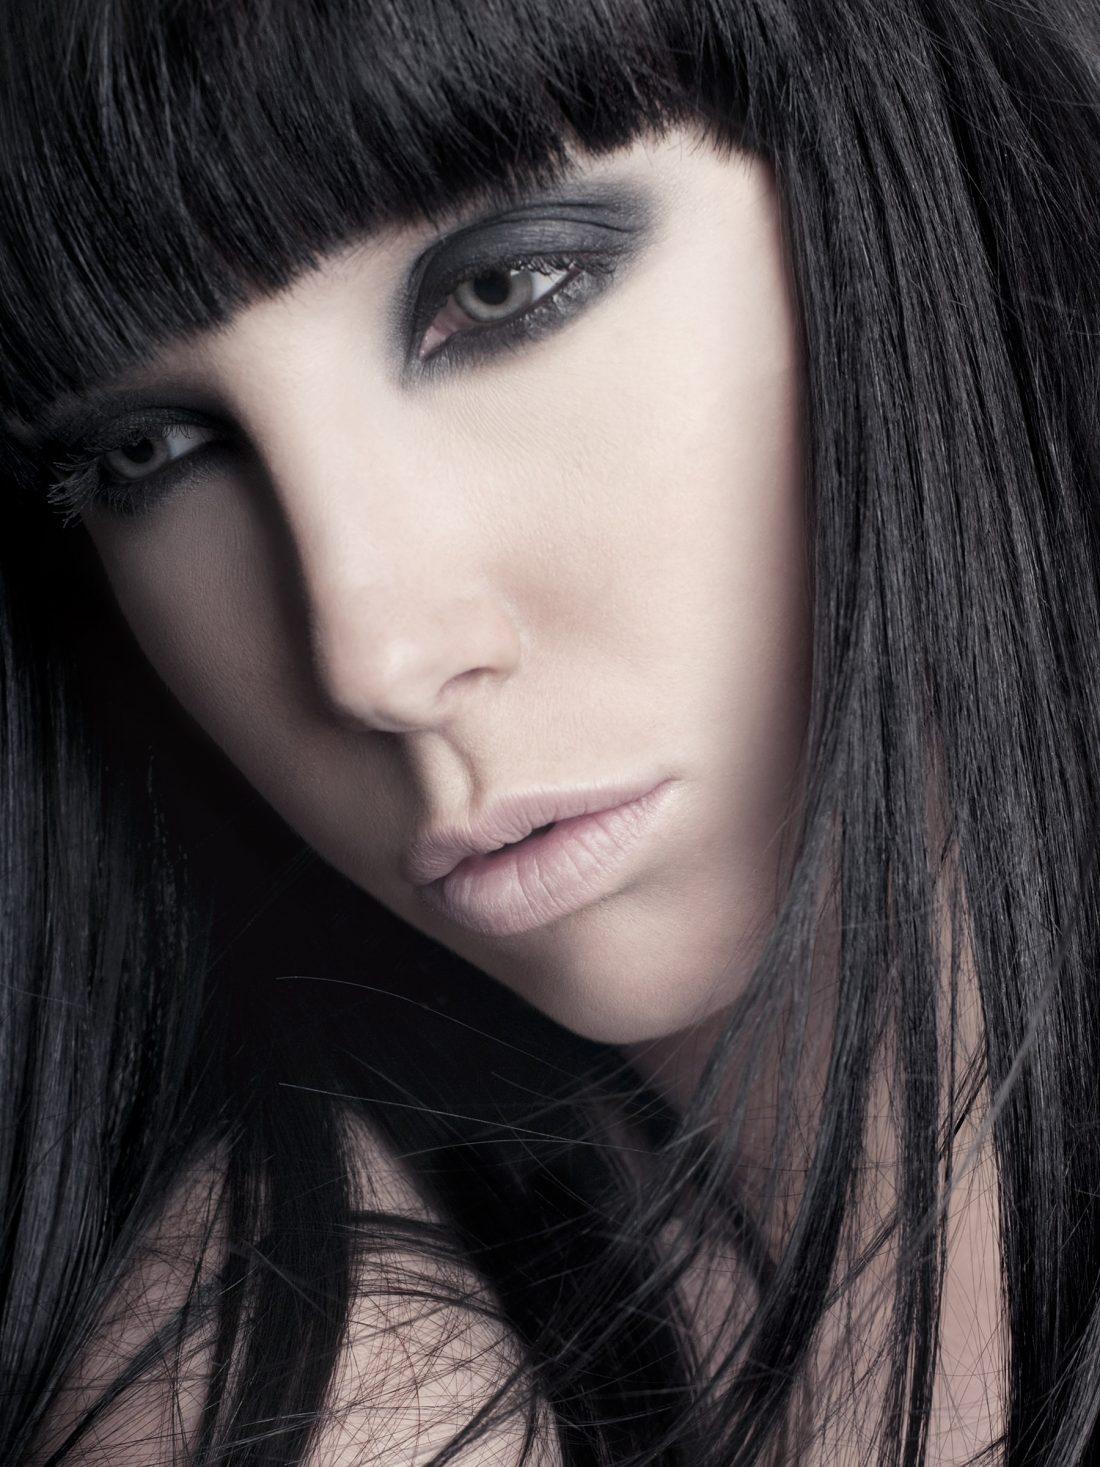 editorial/special fx makeup